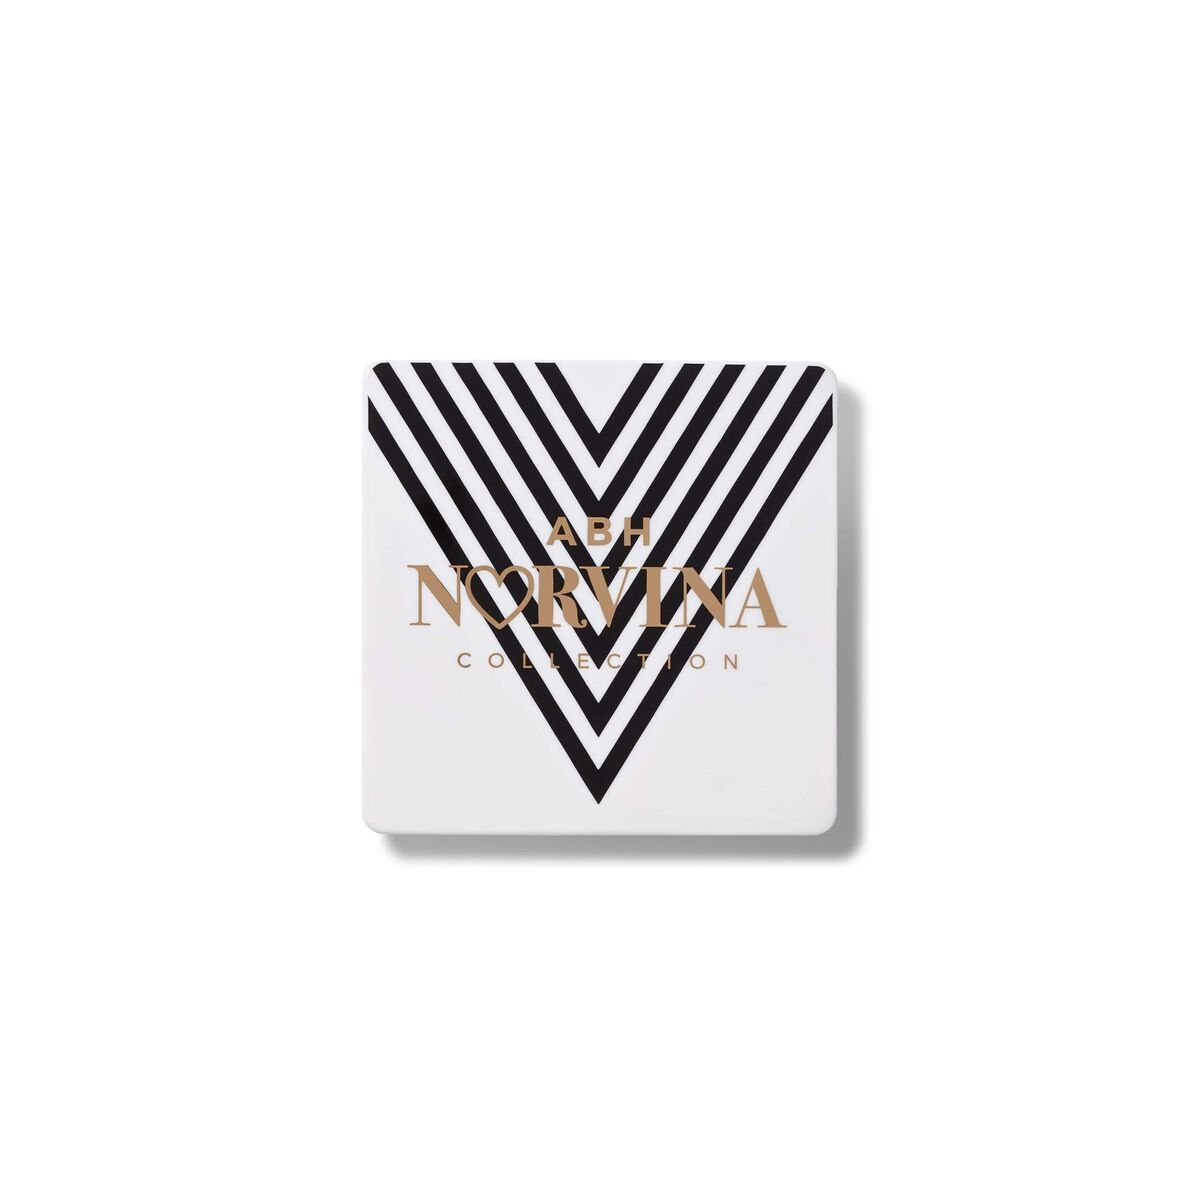 Anastasia Beverly Hills Norvina Mini Pro Pigment Palette Vol.1 палетка теней